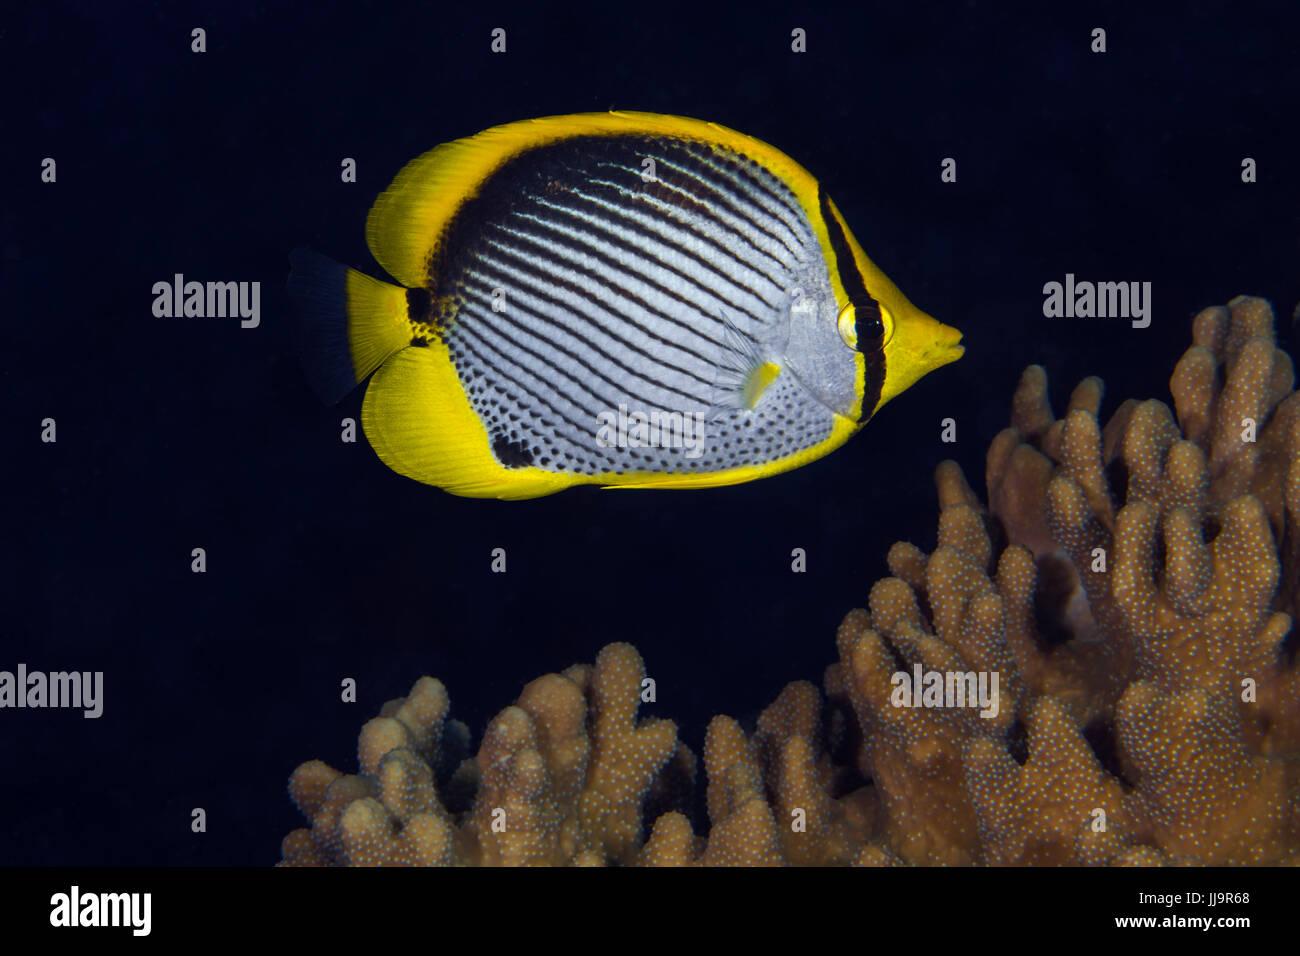 Blackback butterflyfish (Chaetodon melannotus) on coral reef. Spratly Islands, South China Sea - Stock Image